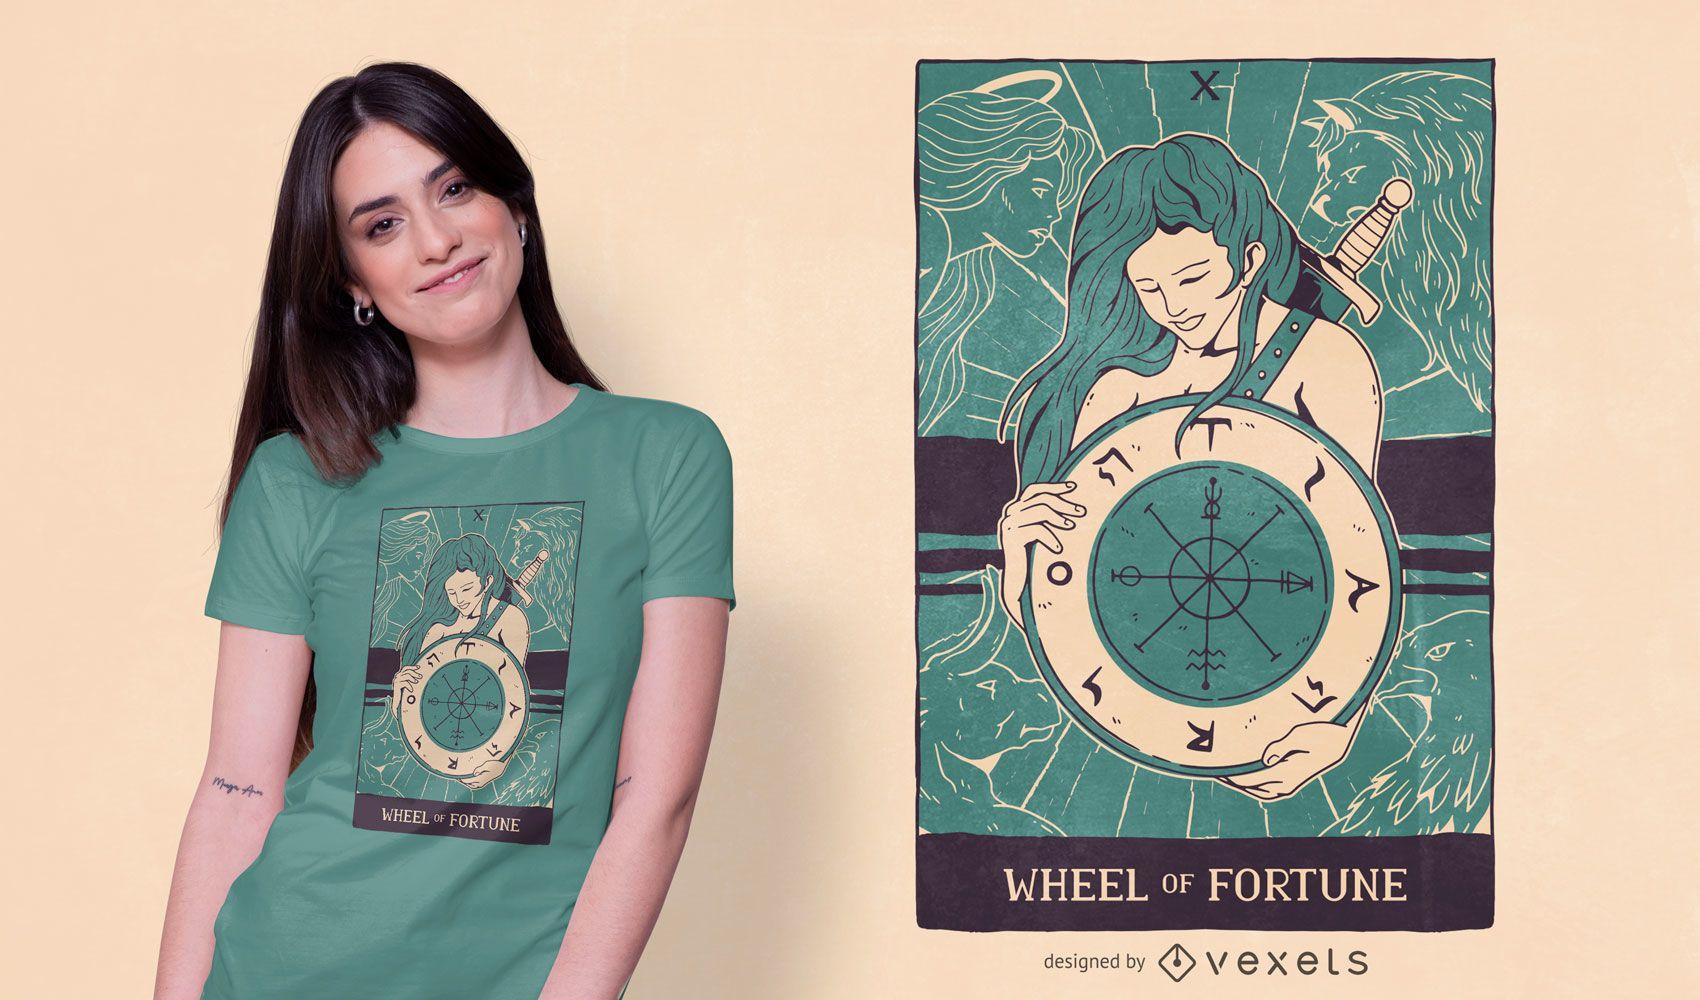 Wheel of fortune tarot t-shirt design